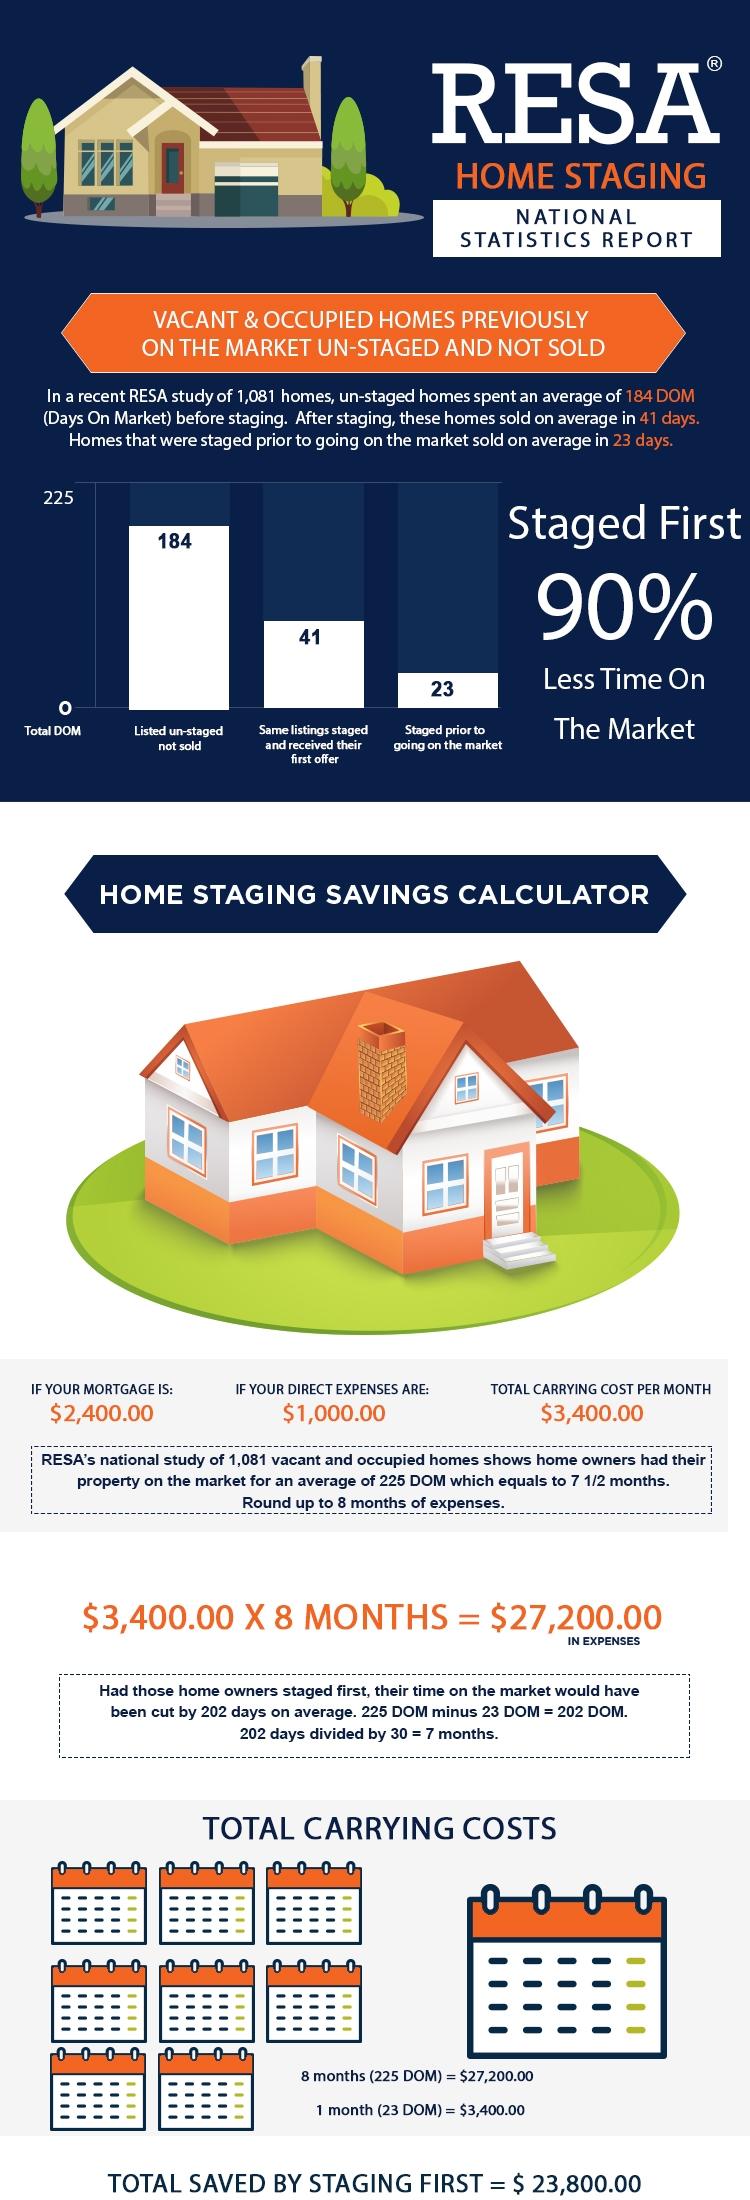 2016-RESA-Home-Staging-Statistics-Report-Final.jpg